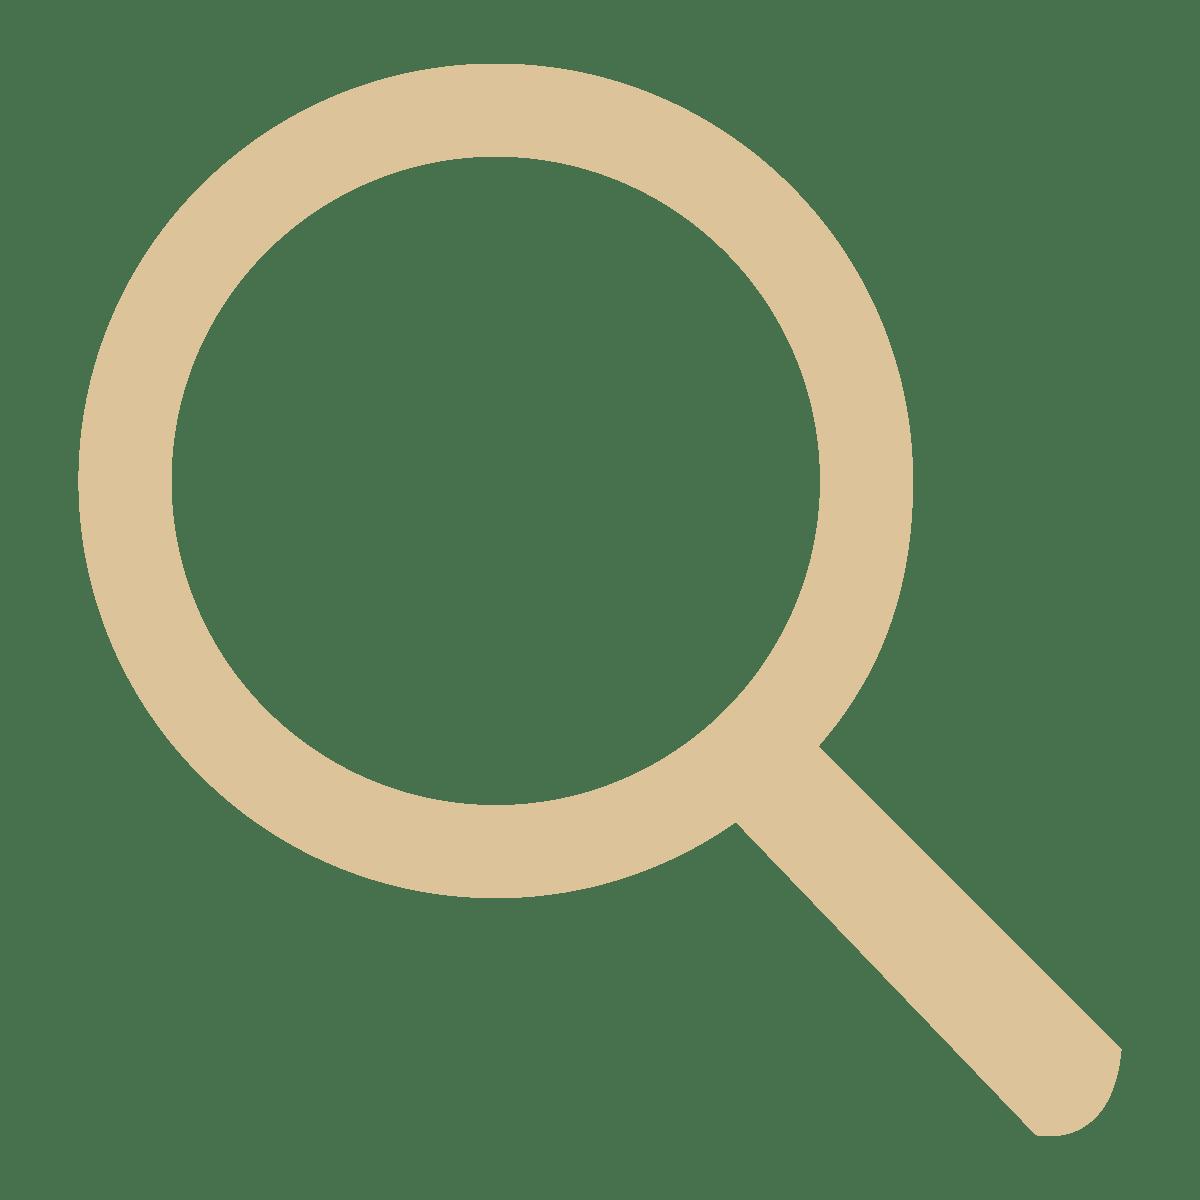 arvense-group-5f-methodology-step-1-find-tan